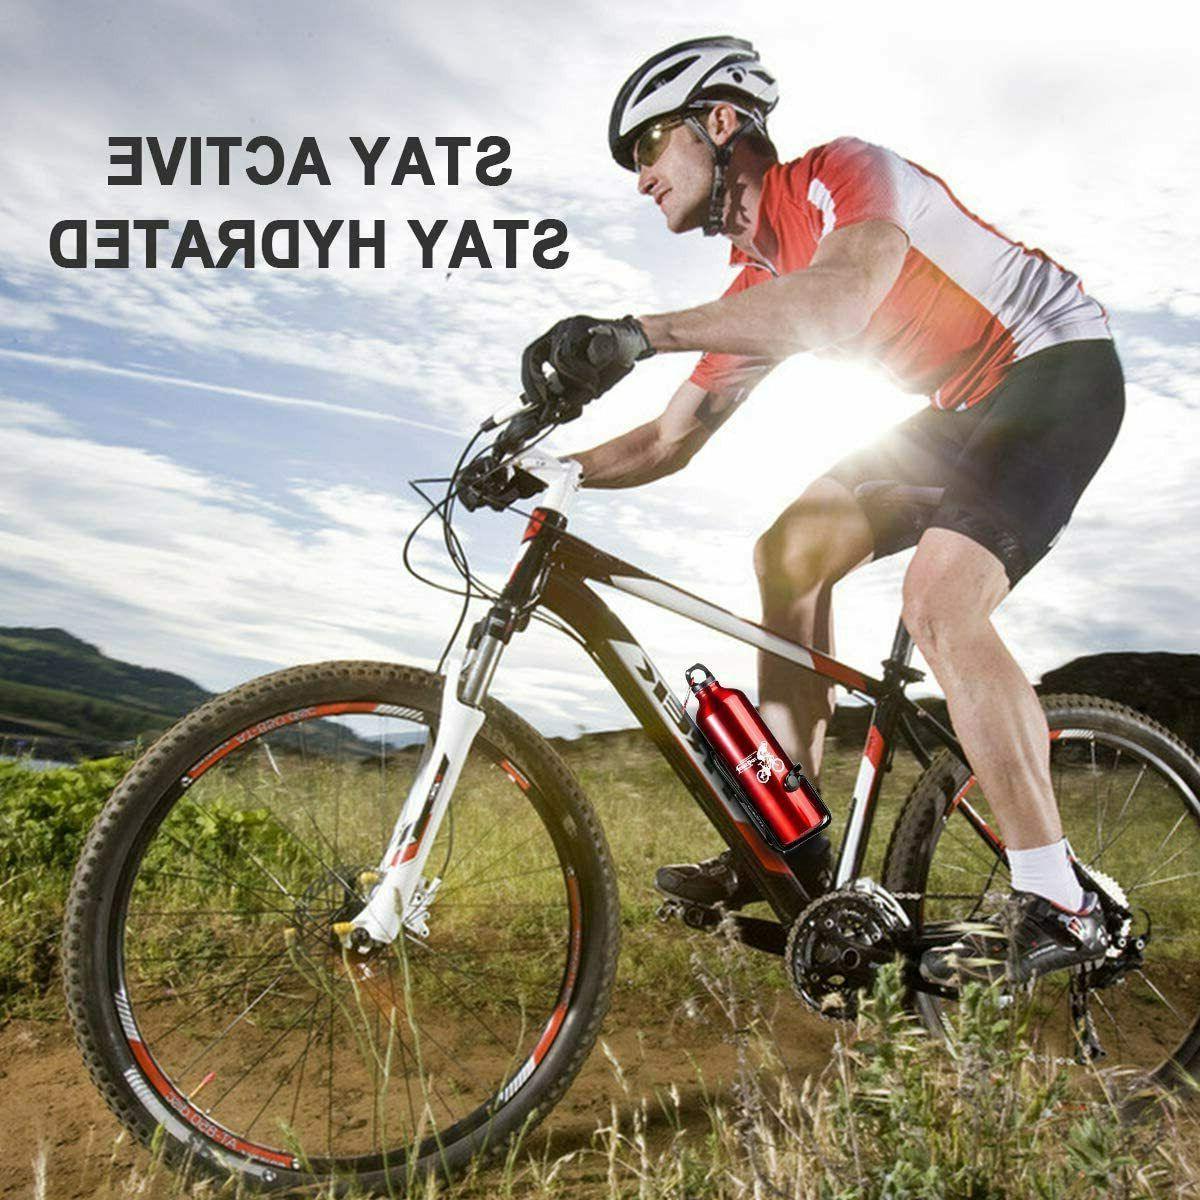 Bike Bicycle Lightweight Aluminum Bottle 2 Packs